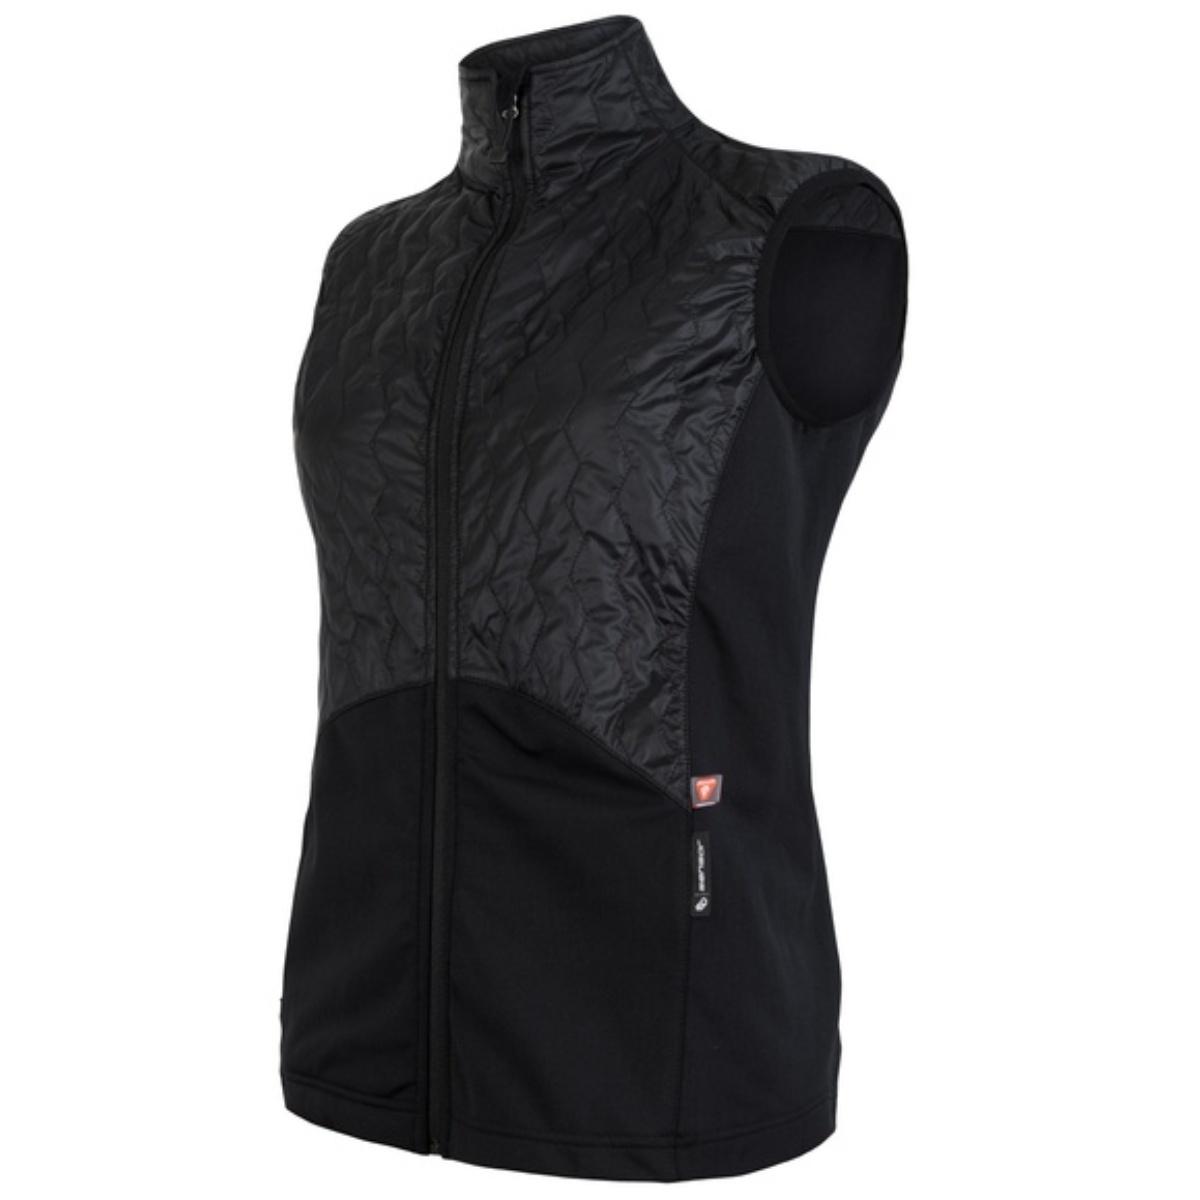 Sensor dámska vesta Infinity Zero čierna